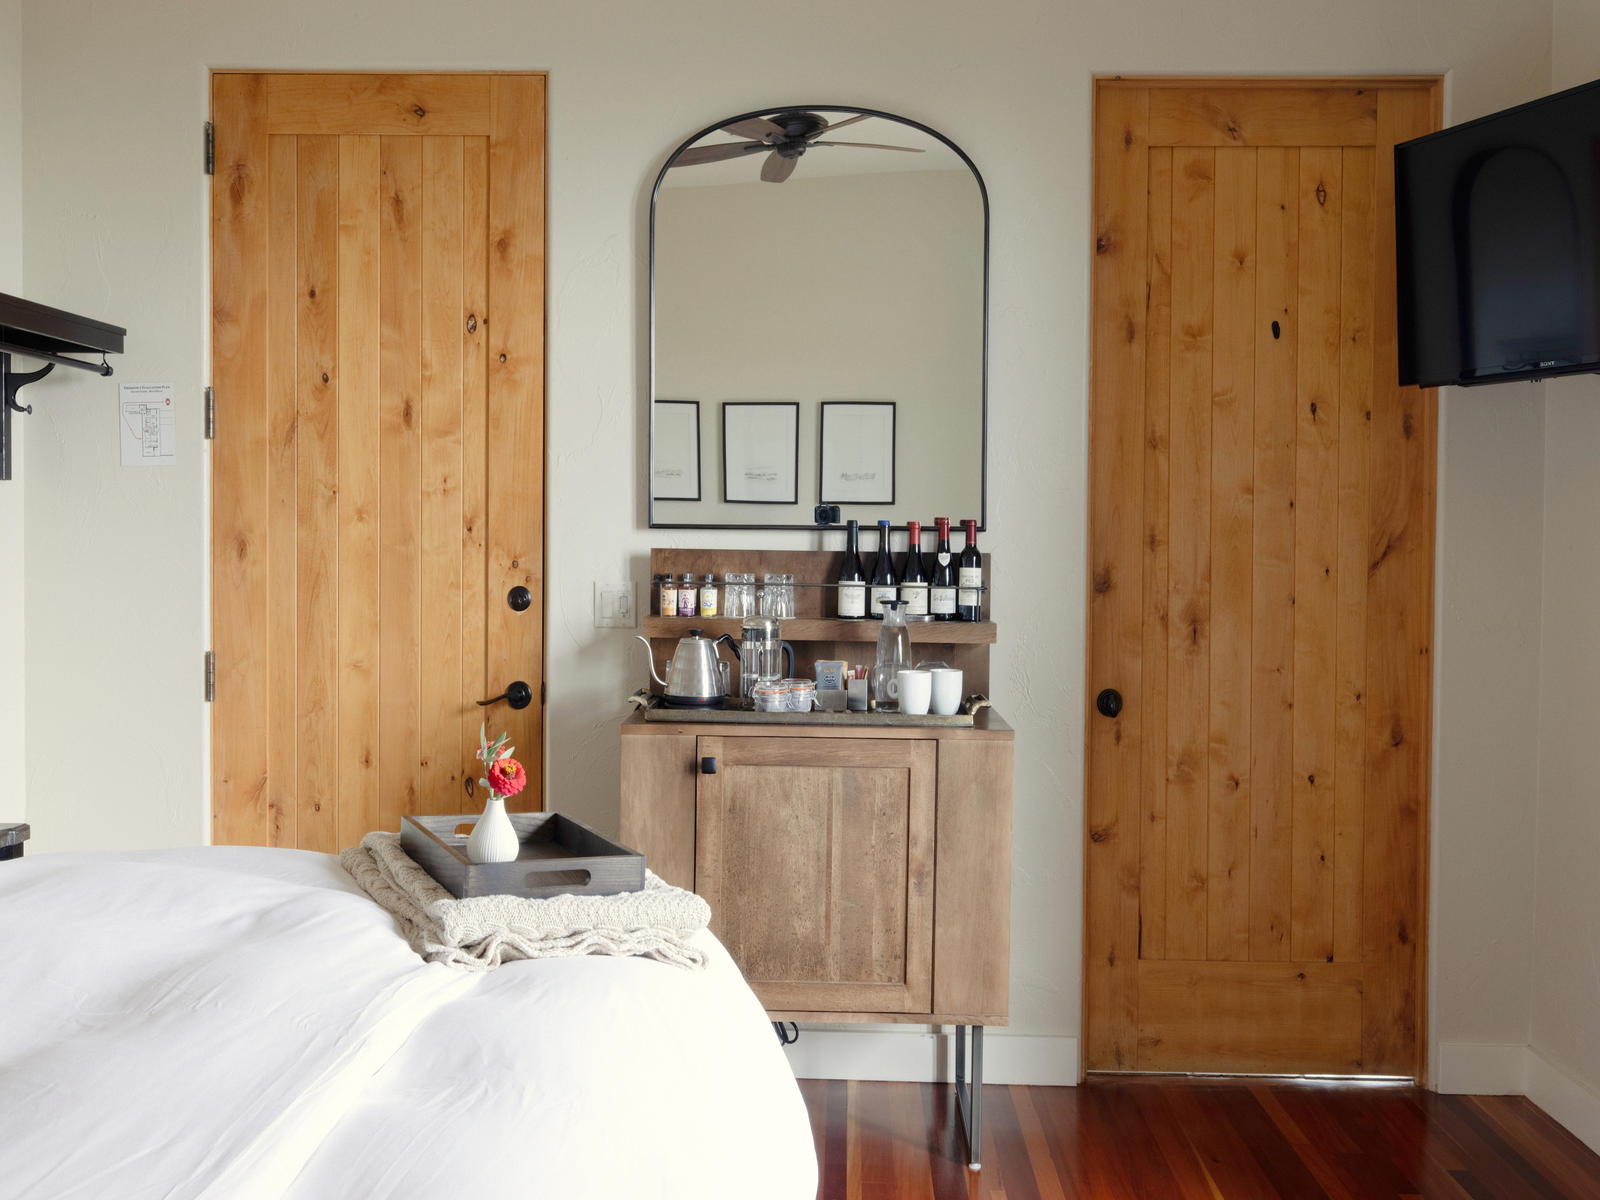 Black Walnut Vineyard - Accommodations - Gallery